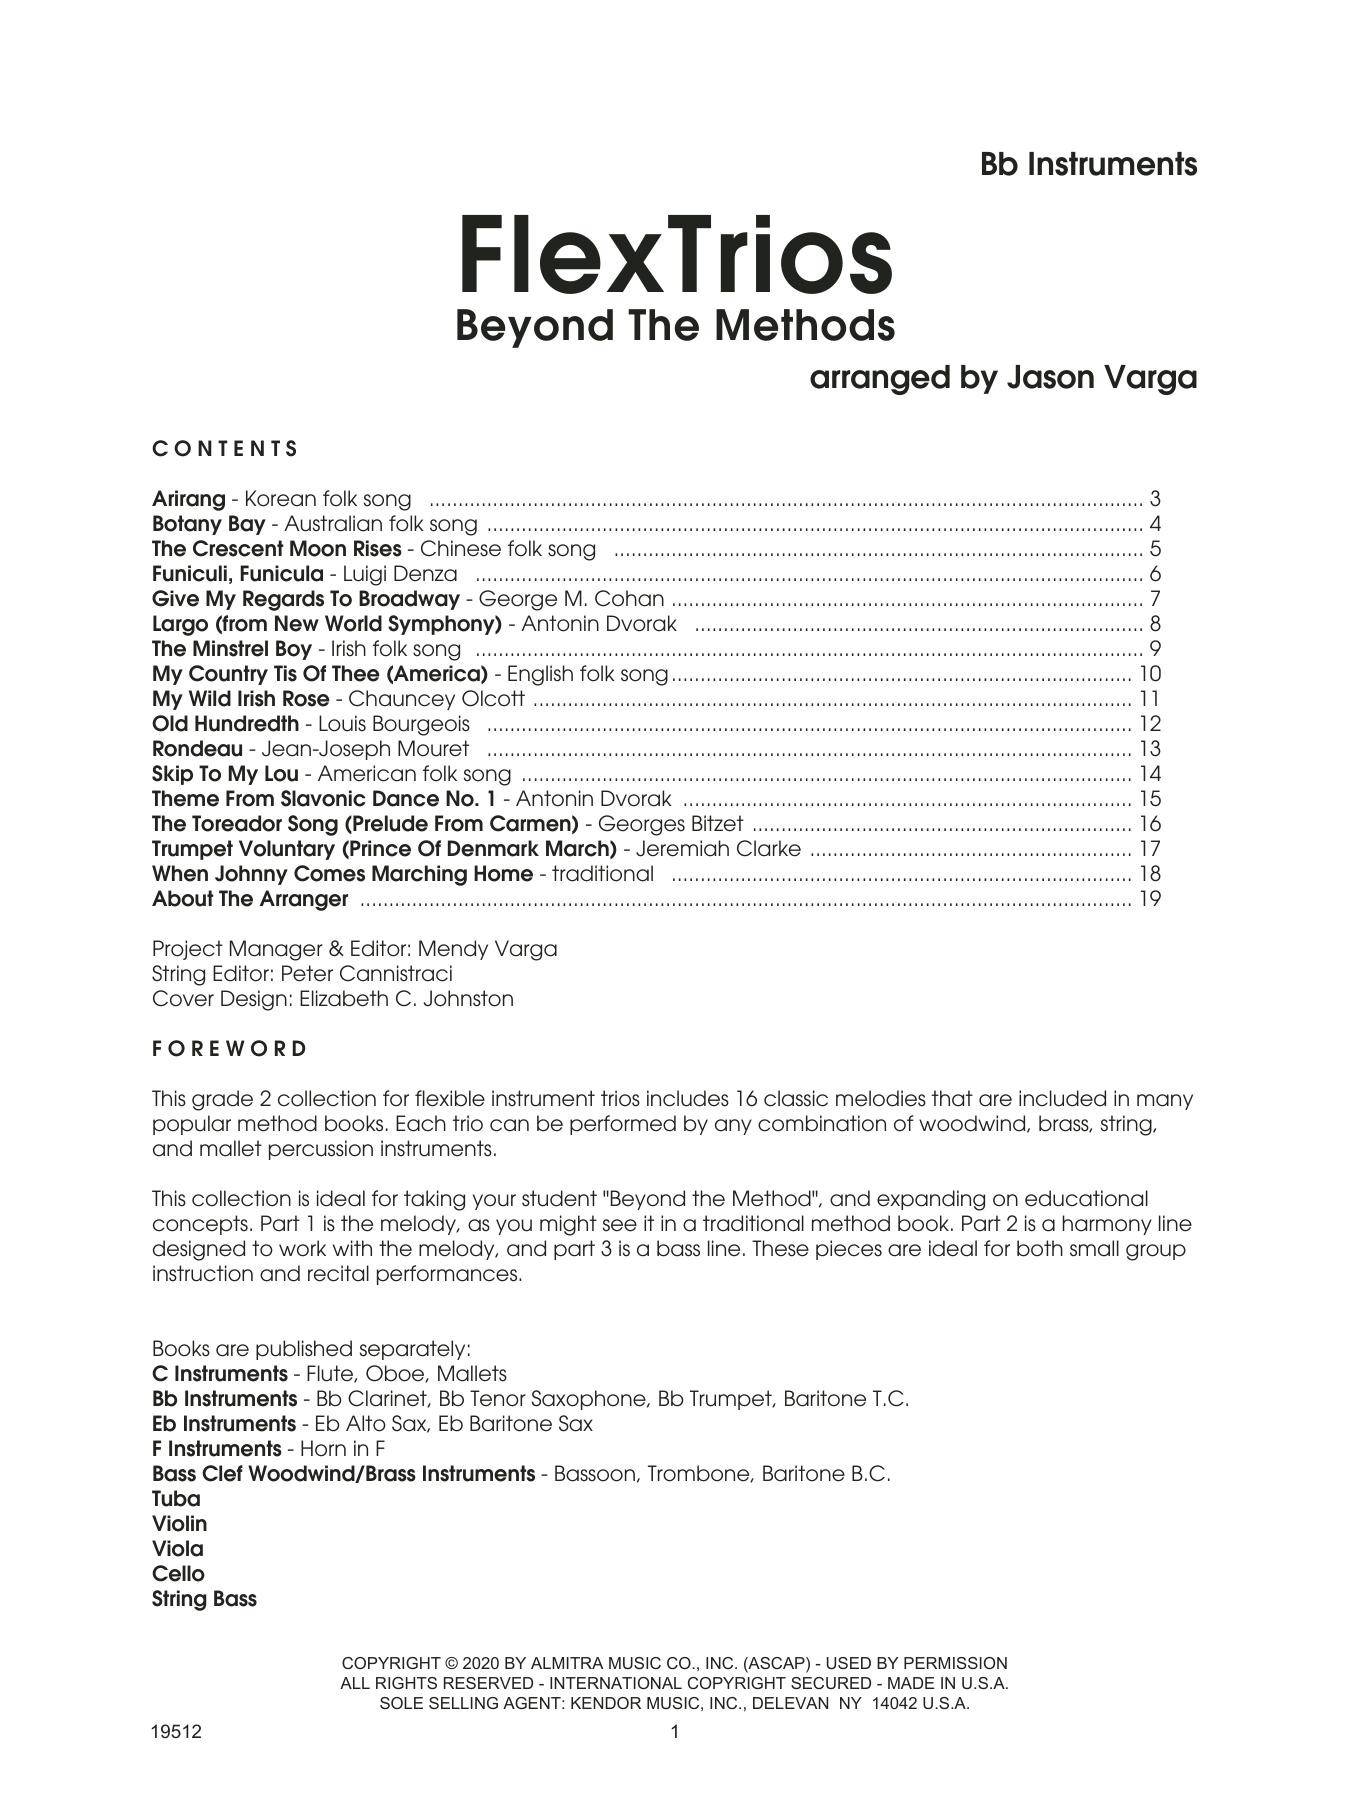 Jason Varga Flextrios - Beyond The Methods (16 Pieces) - Bb Instruments sheet music notes printable PDF score